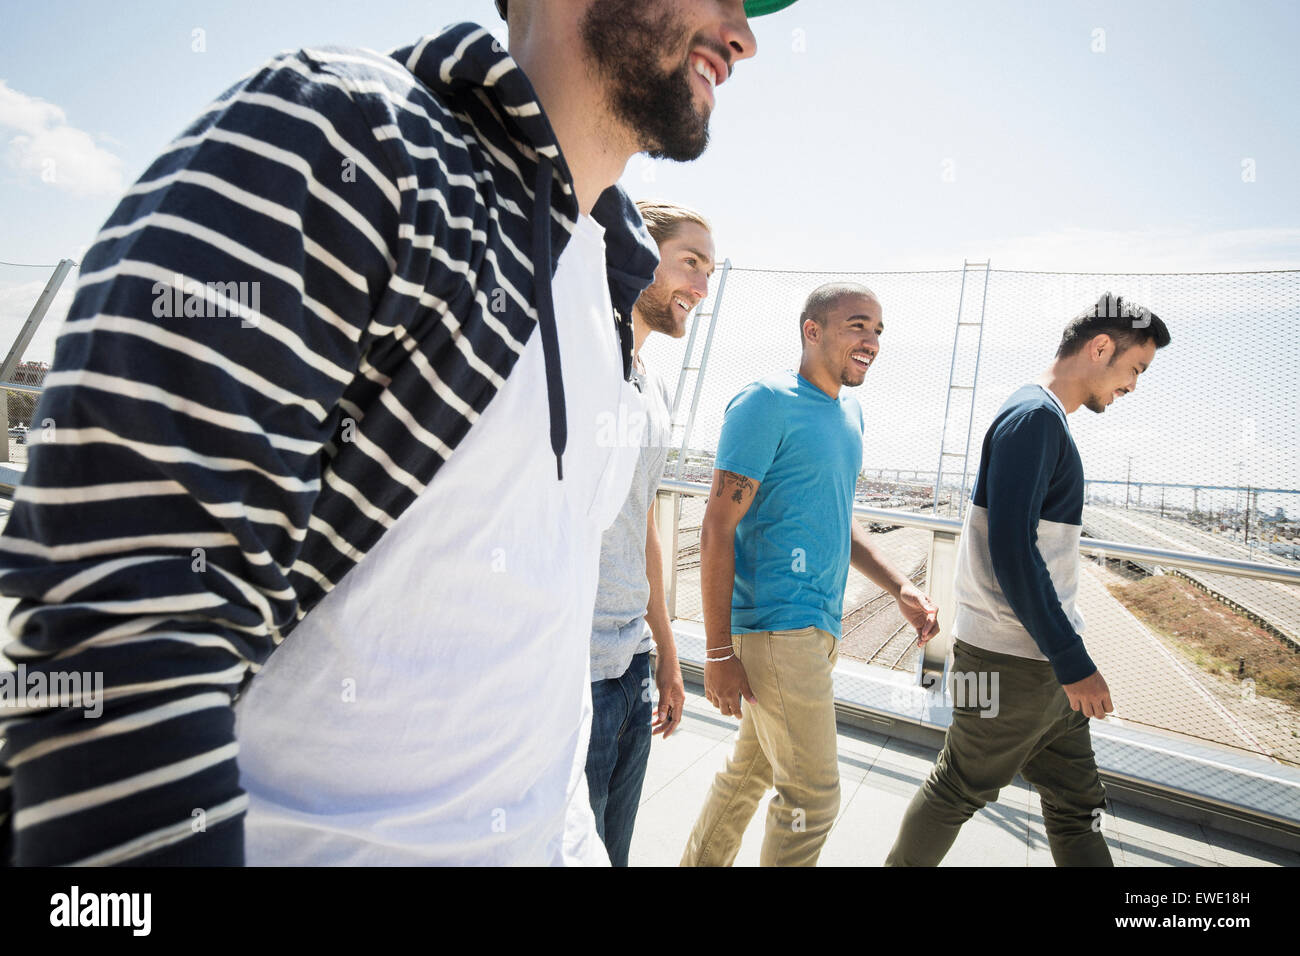 Gruppe junger Männer zu Fuß entlang der Fußgängerbrücke Stockbild